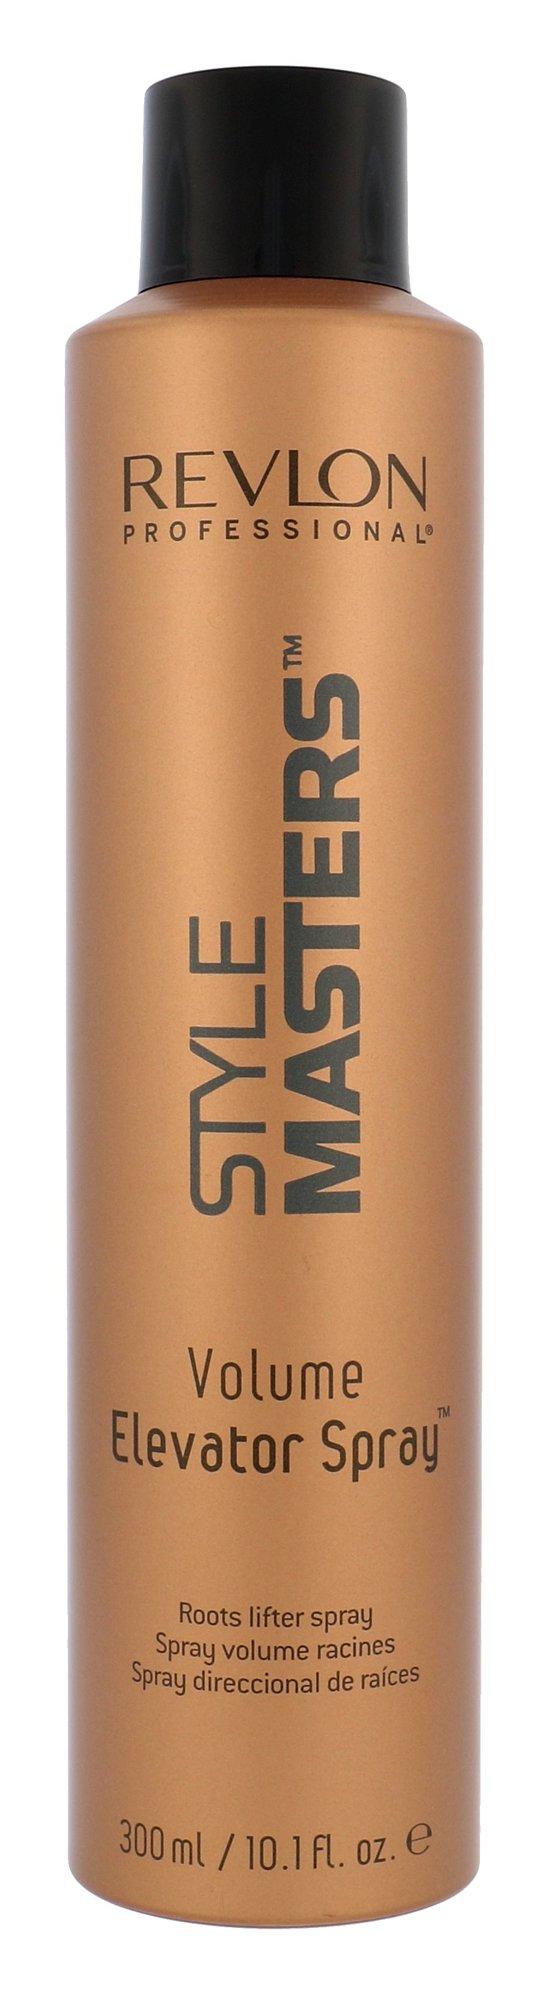 Revlon Professional Style Masters Volume Elevator Spray Cosmetic 300ml